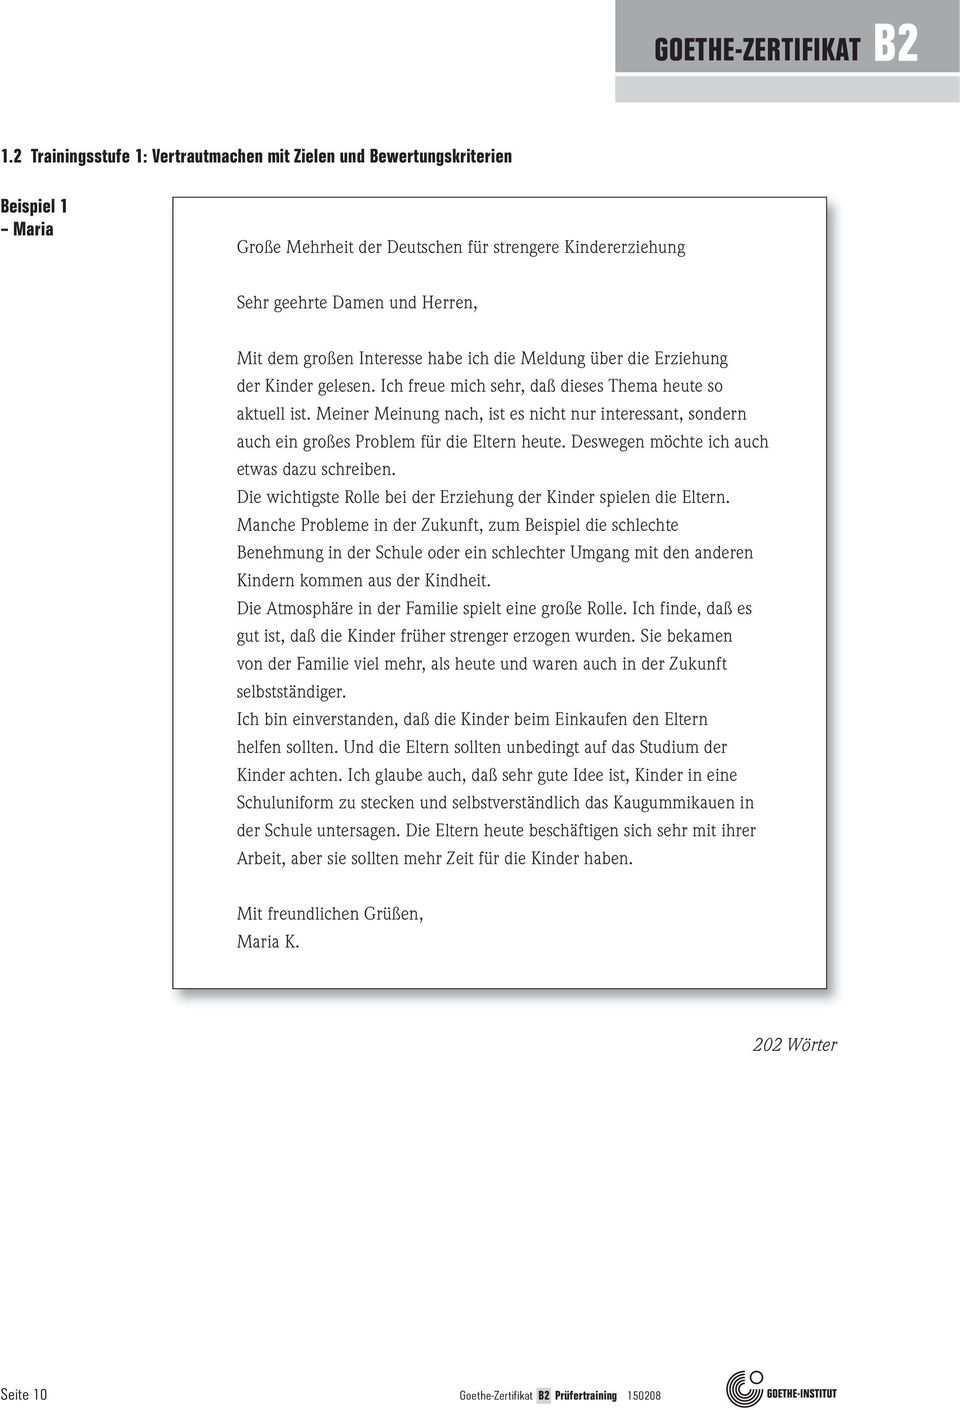 Goethe Zertifikat B2 Trainingsmaterial Fur Prufende Schriftlich Mundlich B1 B2 C1 C2 Pdf Free Download